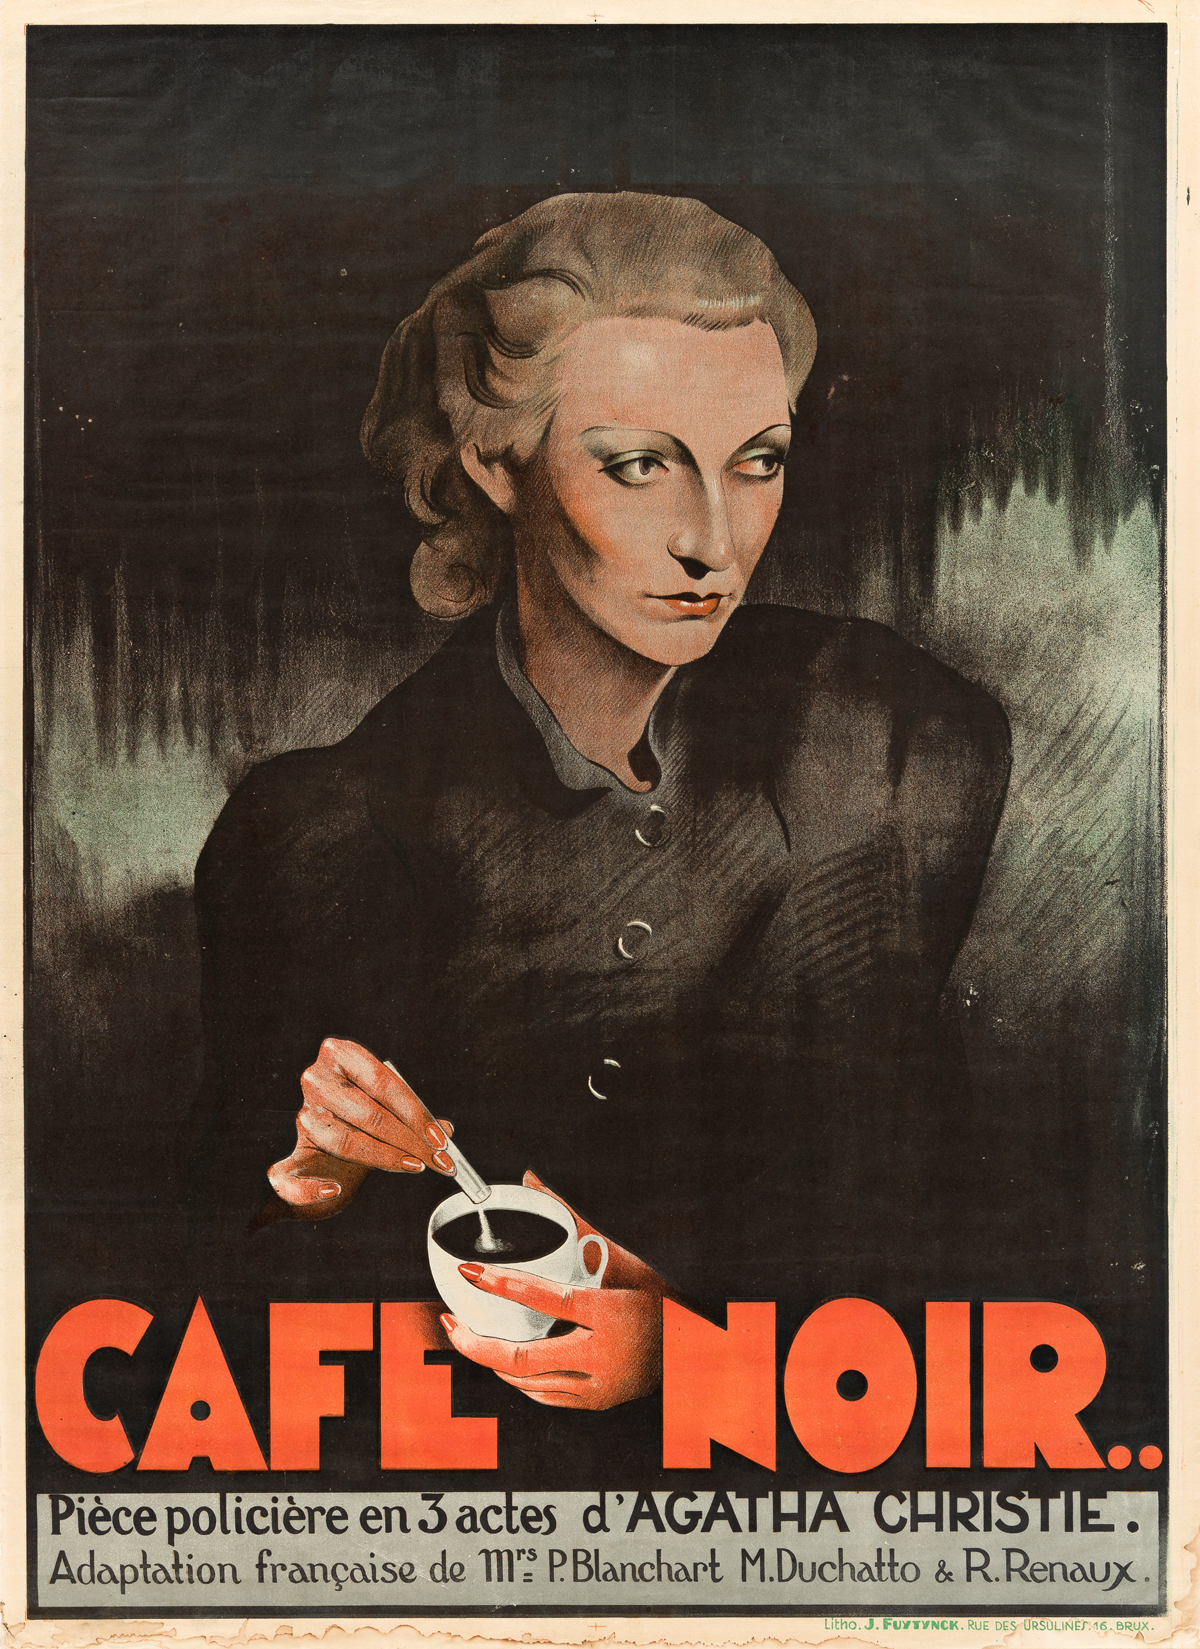 DESIGNER UNKNOWN.  CAFE NOIR / AGATHA CHRISTIE. 1938. 33½x24¼ inches, 85x61½ cm. J. Fuytynck, Brussels.